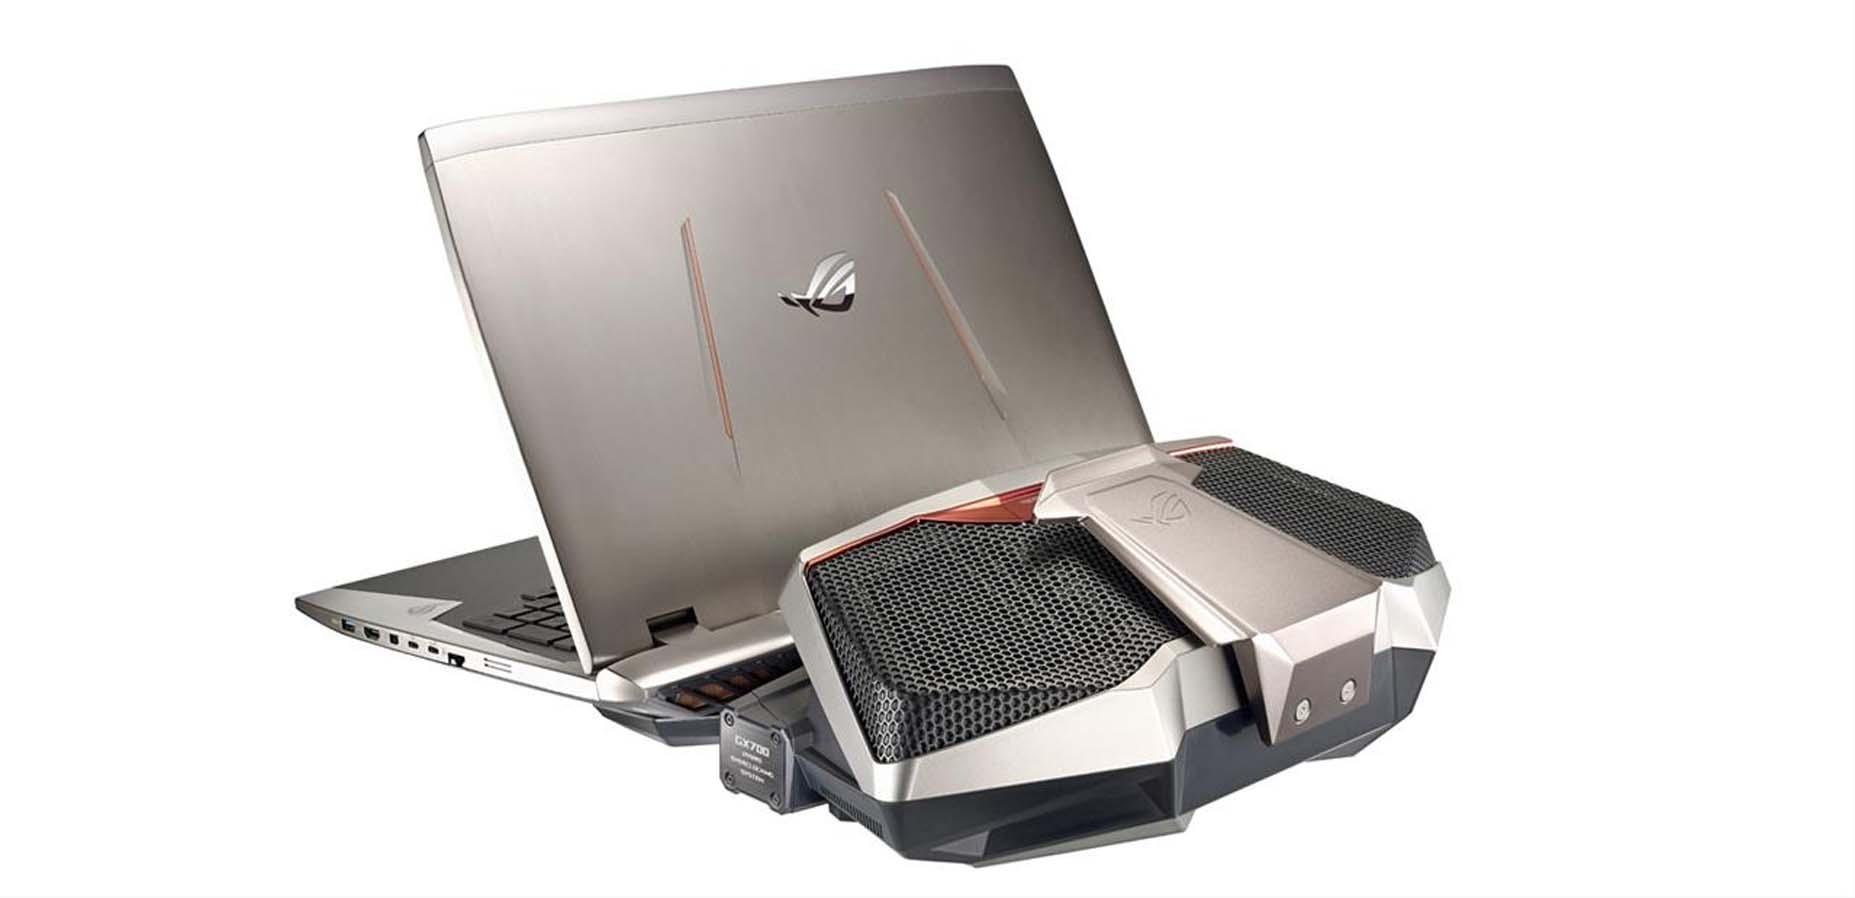 Harga Jual Asus Rog Gx700vo Laptop Gaming Core I7